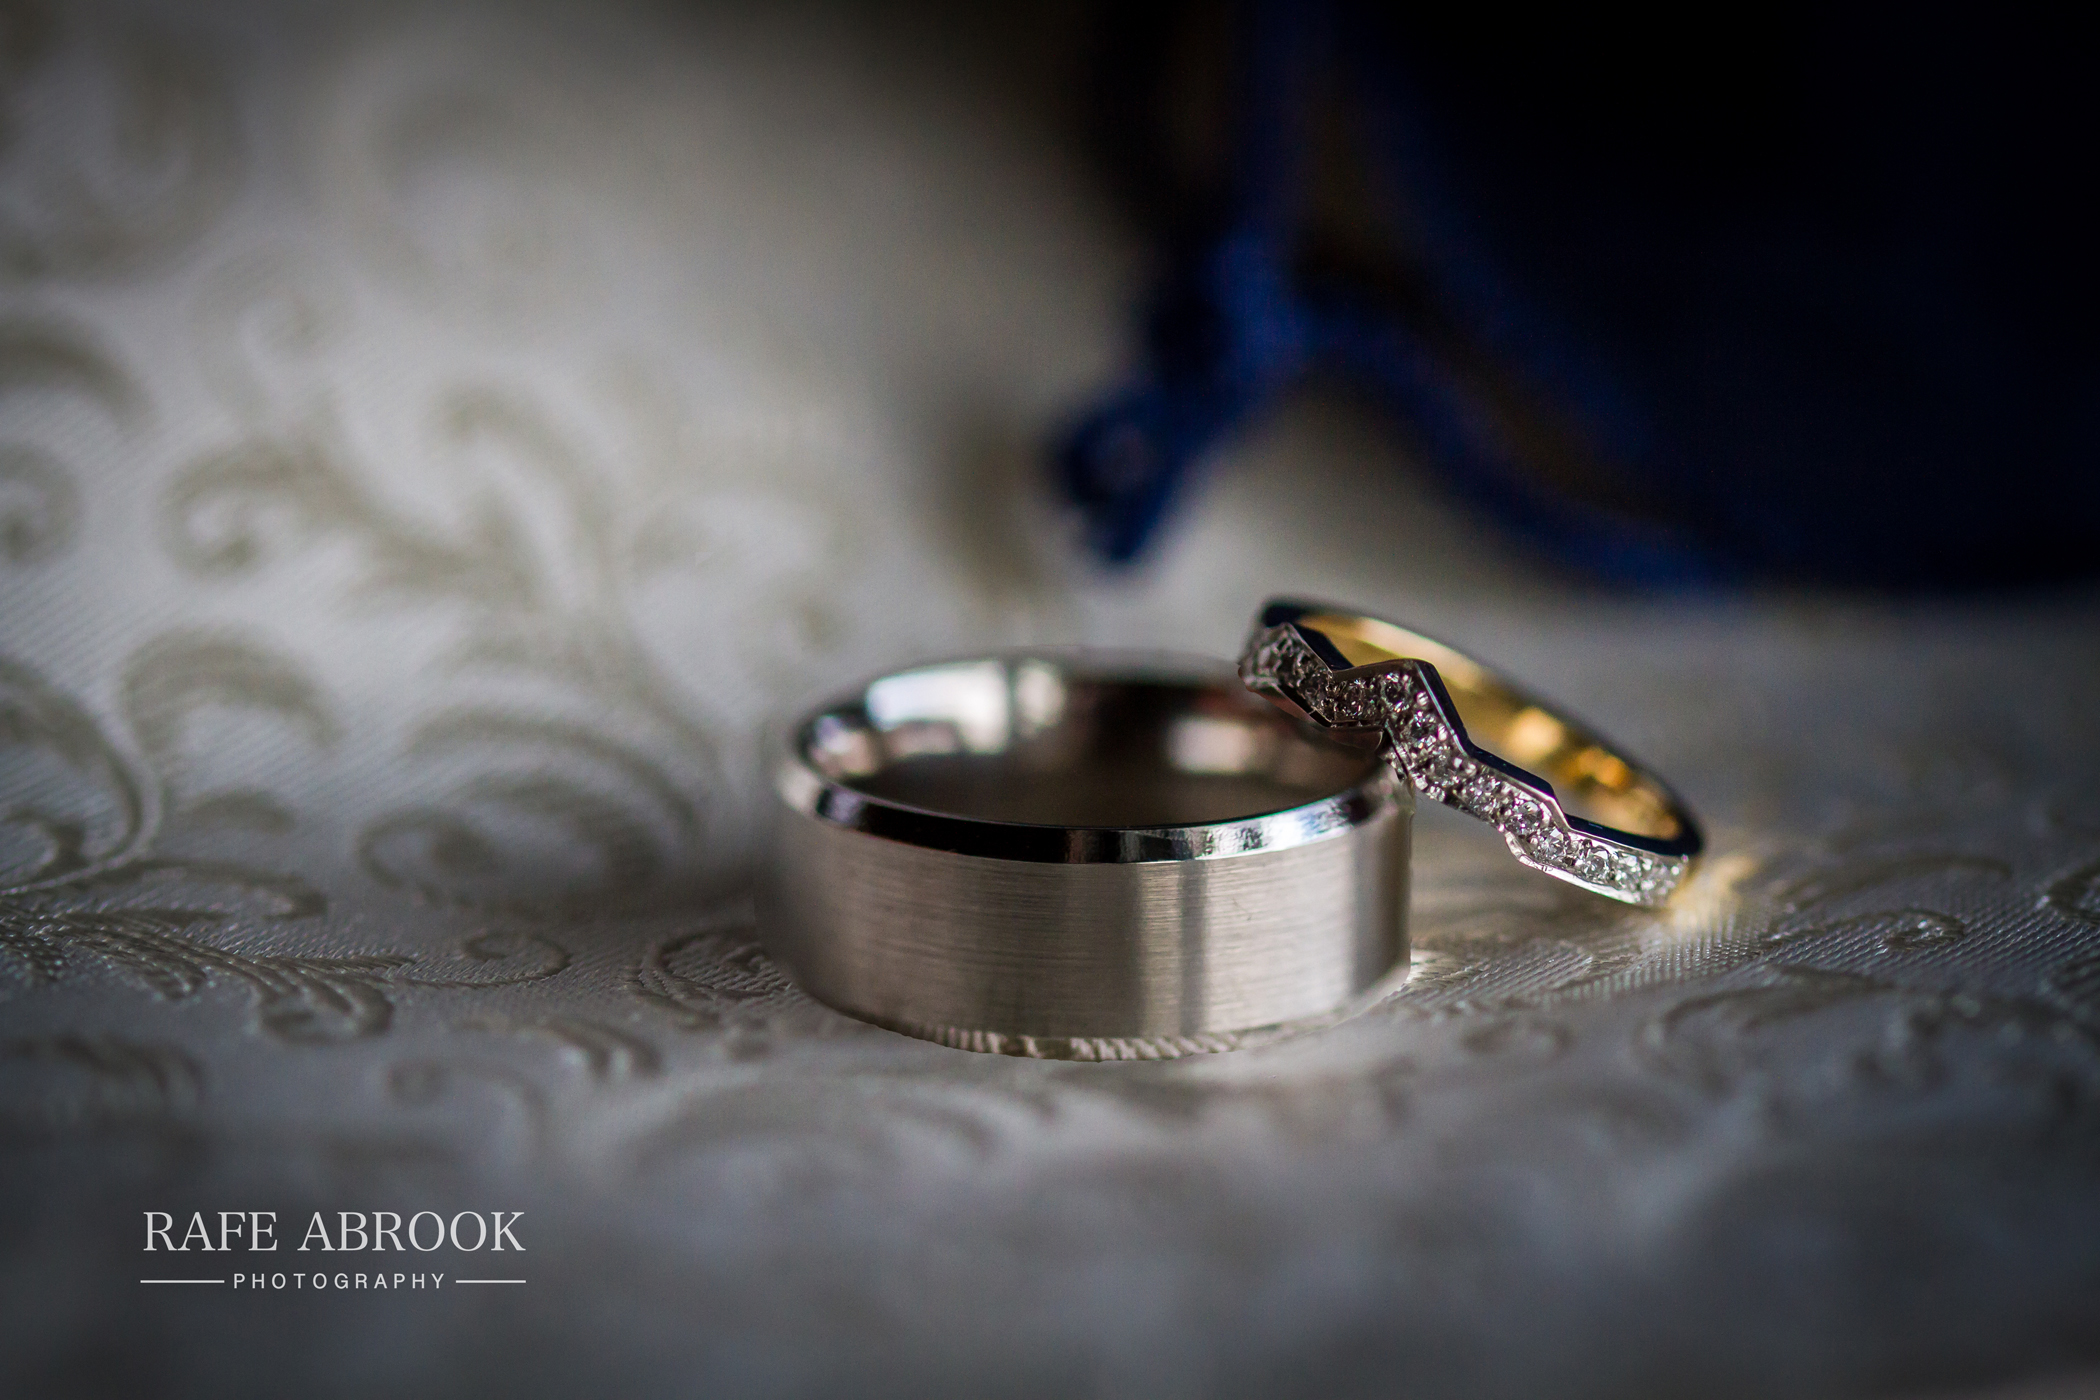 roma & pete wedding hampstead shenley hertfordshire -16.jpg